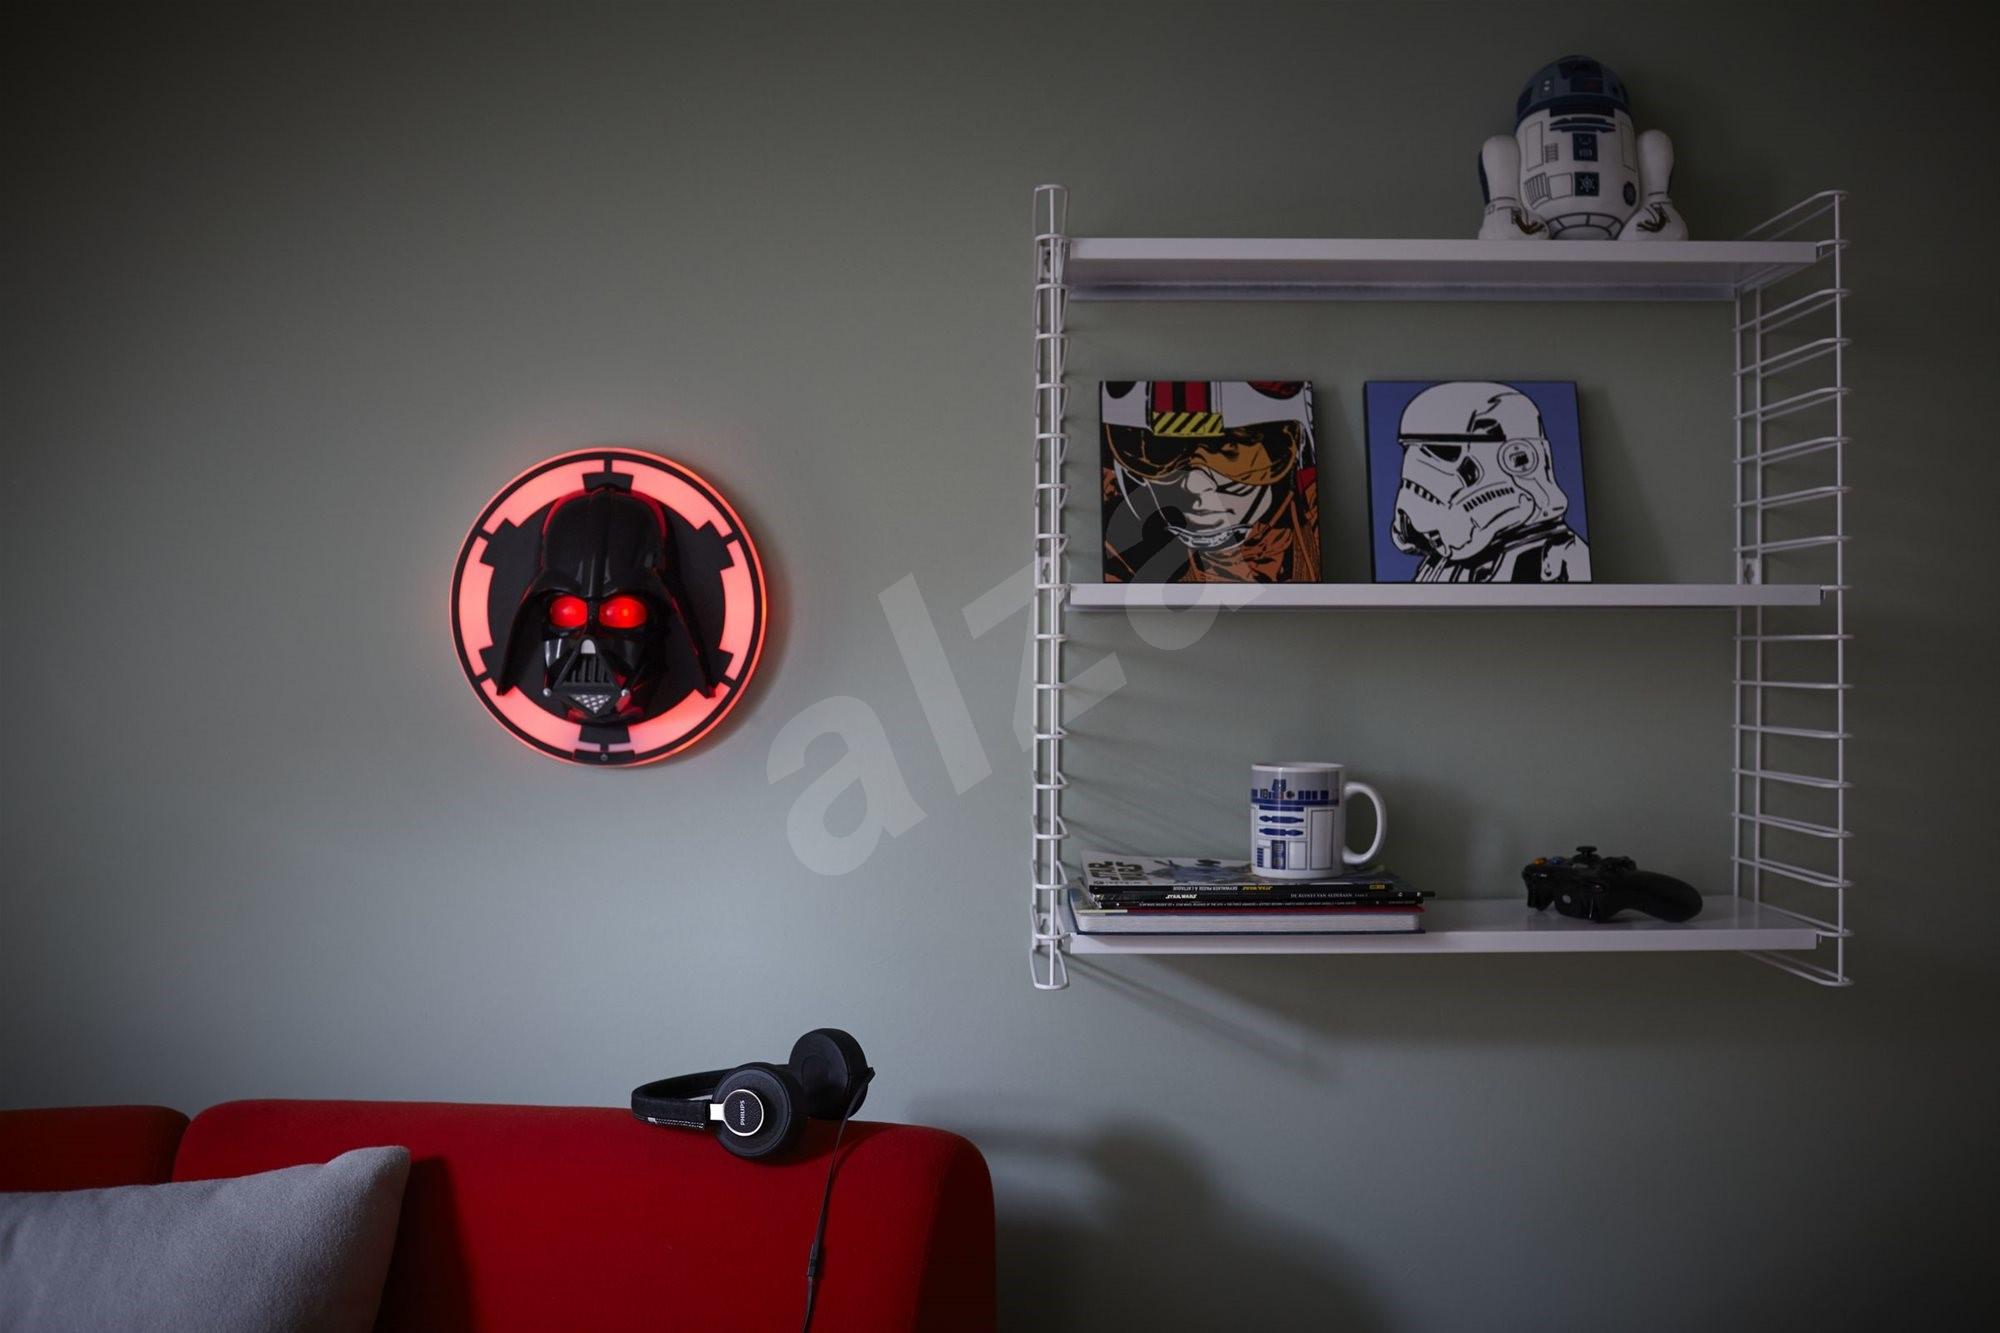 disney star wars philips 71936 30 p0 lampe. Black Bedroom Furniture Sets. Home Design Ideas